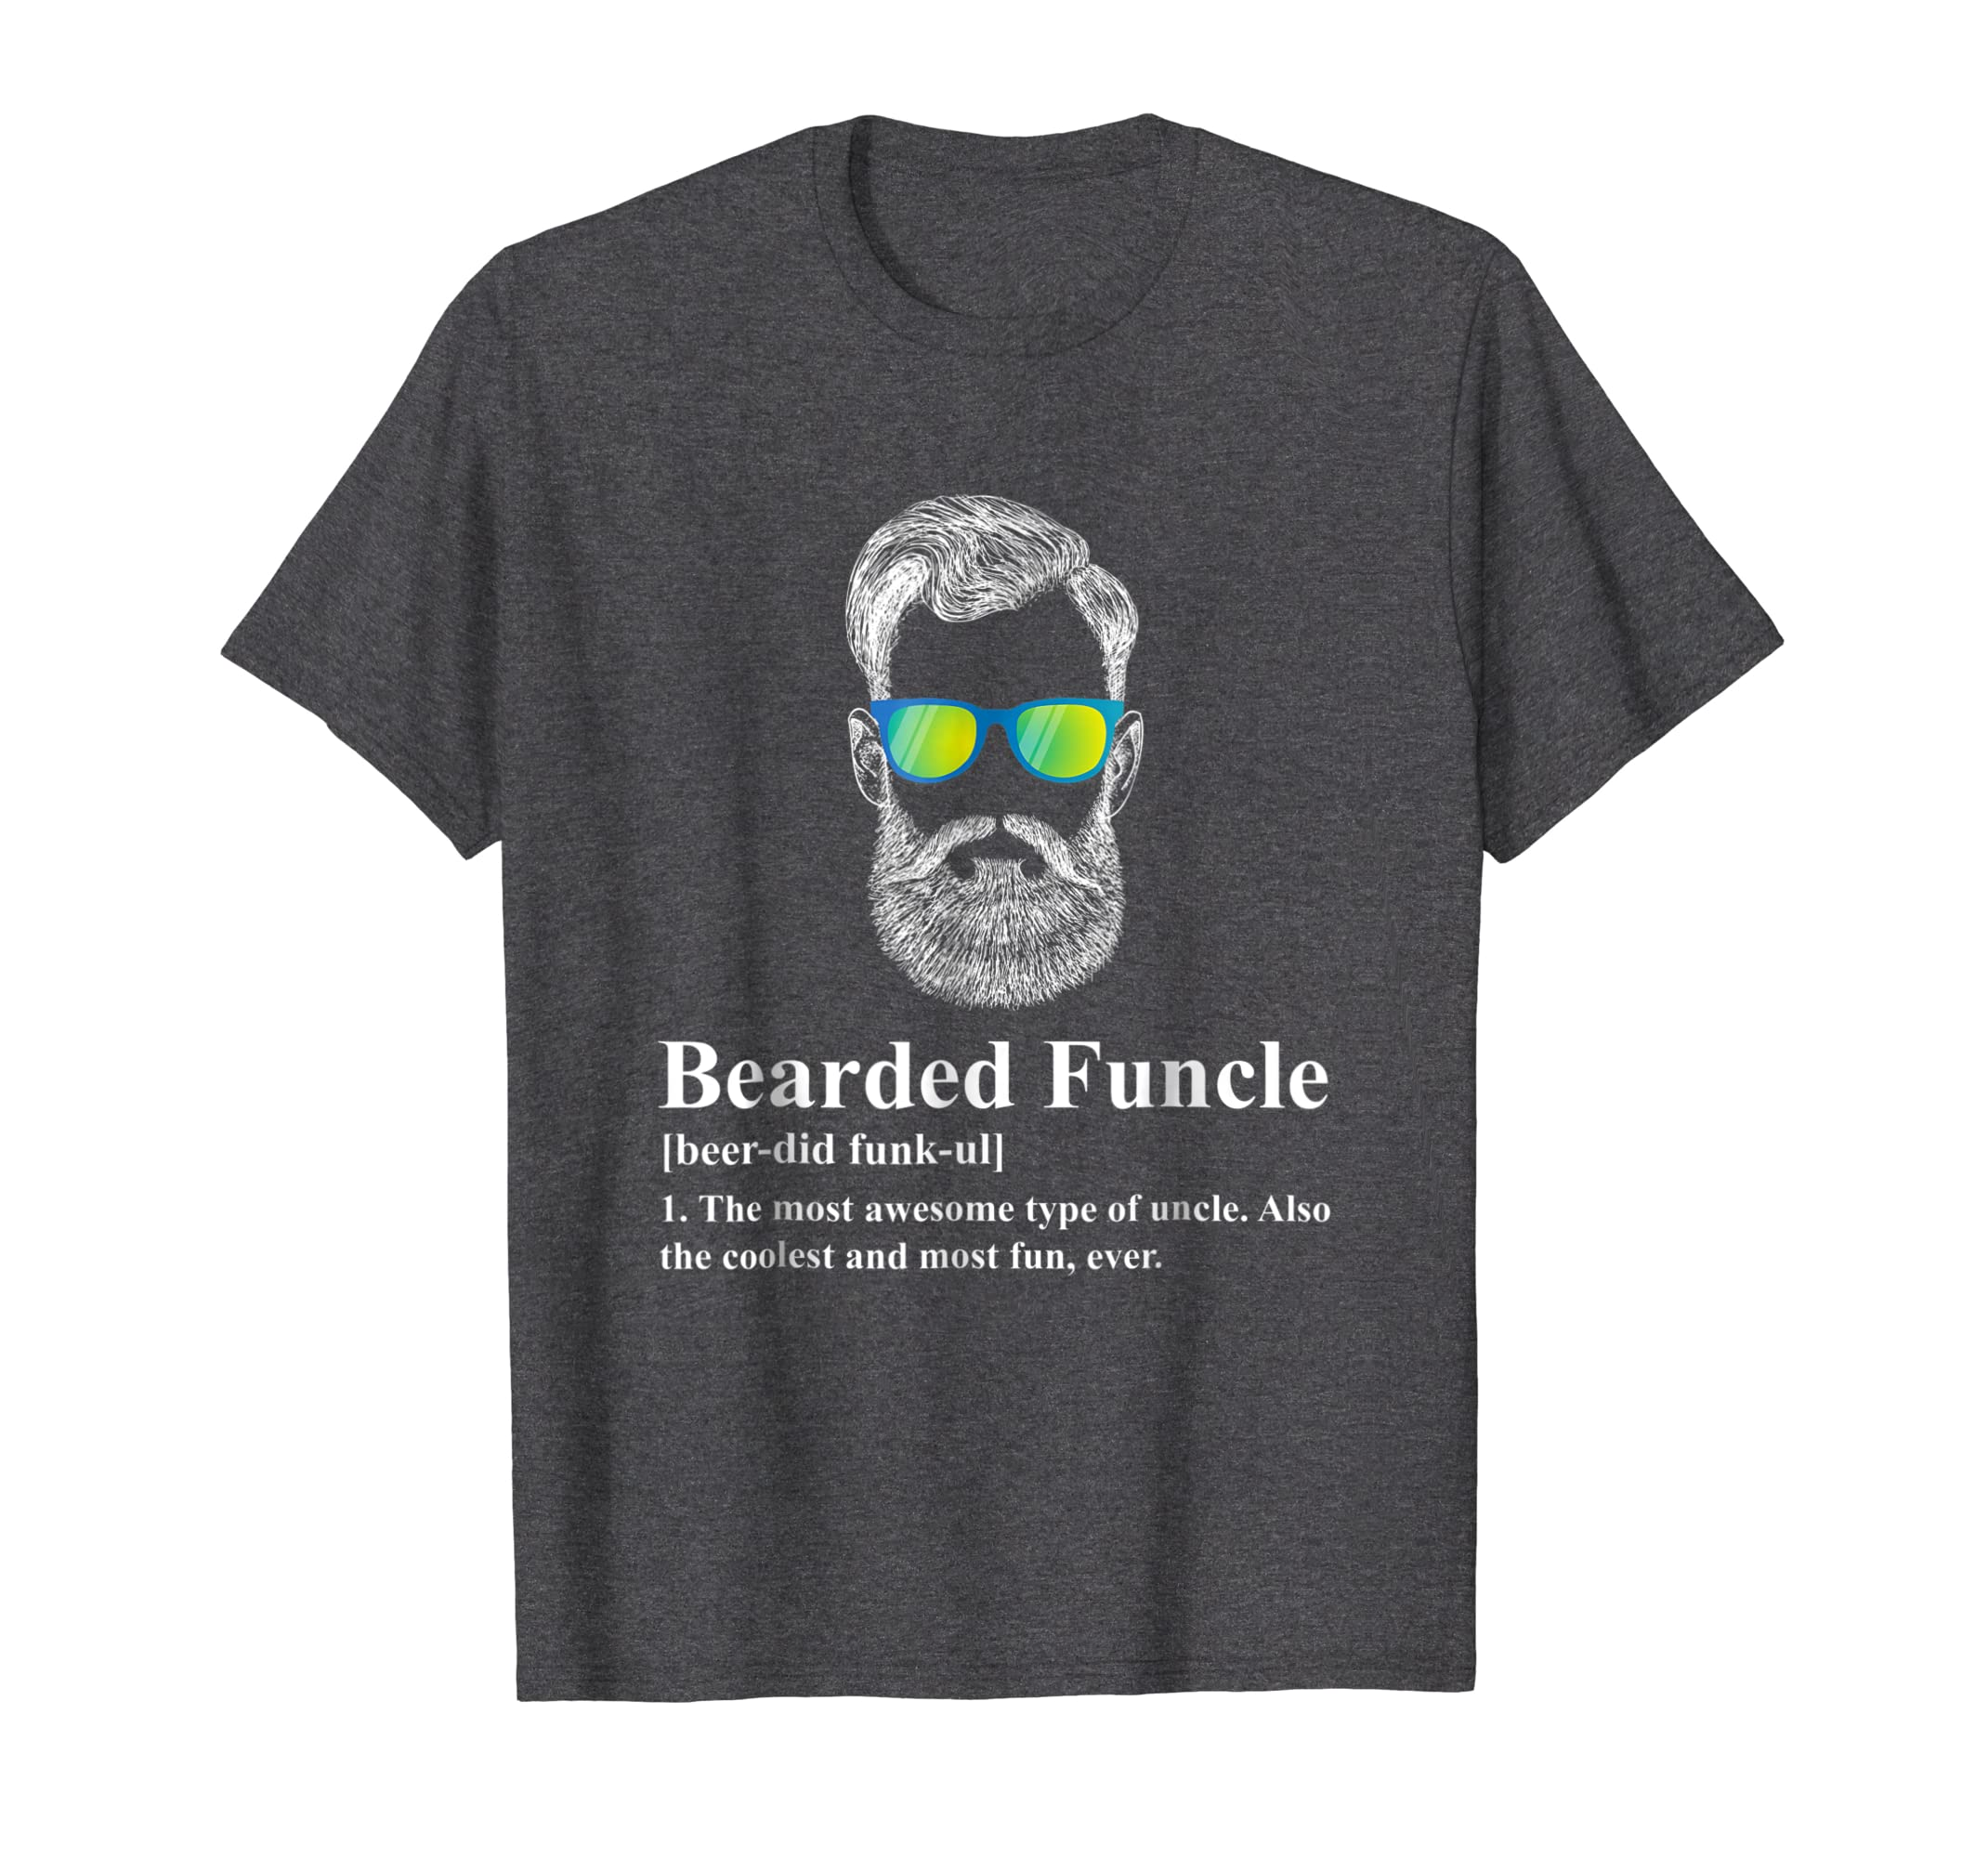 Amazon Funny Bearded Funcle Shirt For Men Clothing